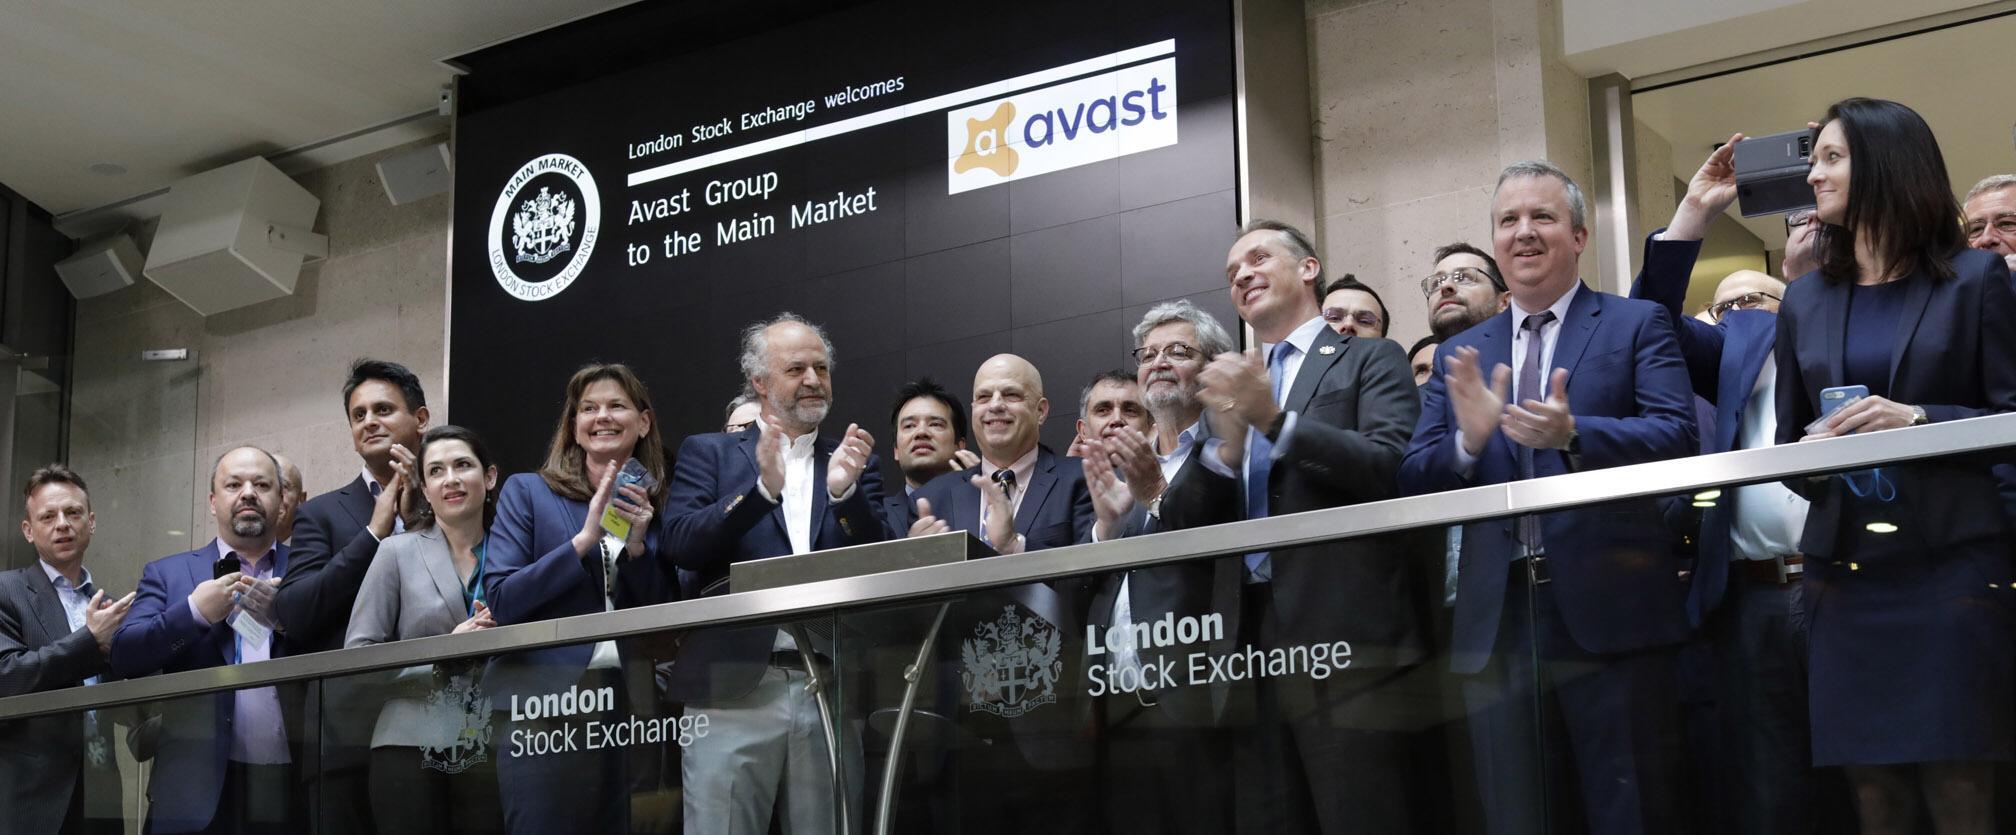 London stock exchange avast ipo